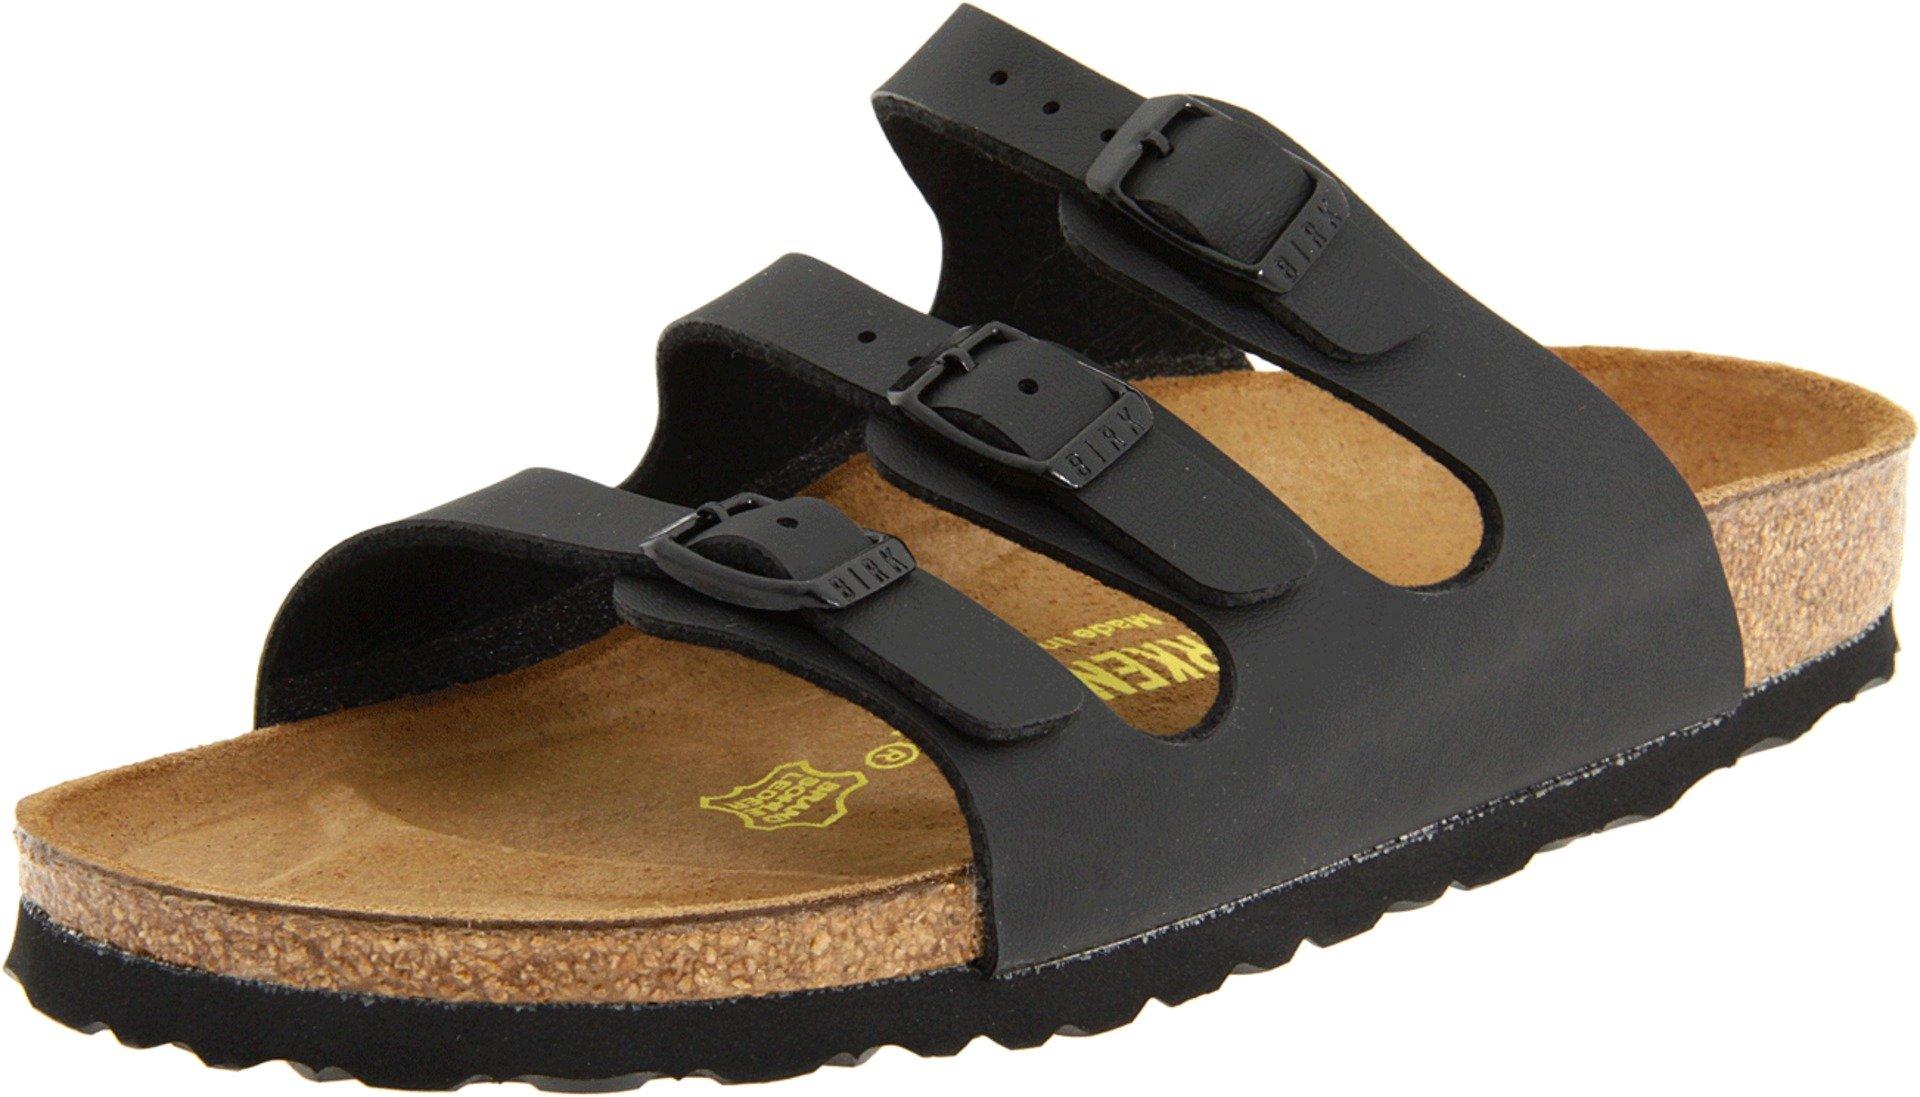 Birkenstock Women's Florida Sandals,Black,38 N EU / 7-7.5 AA(N) US